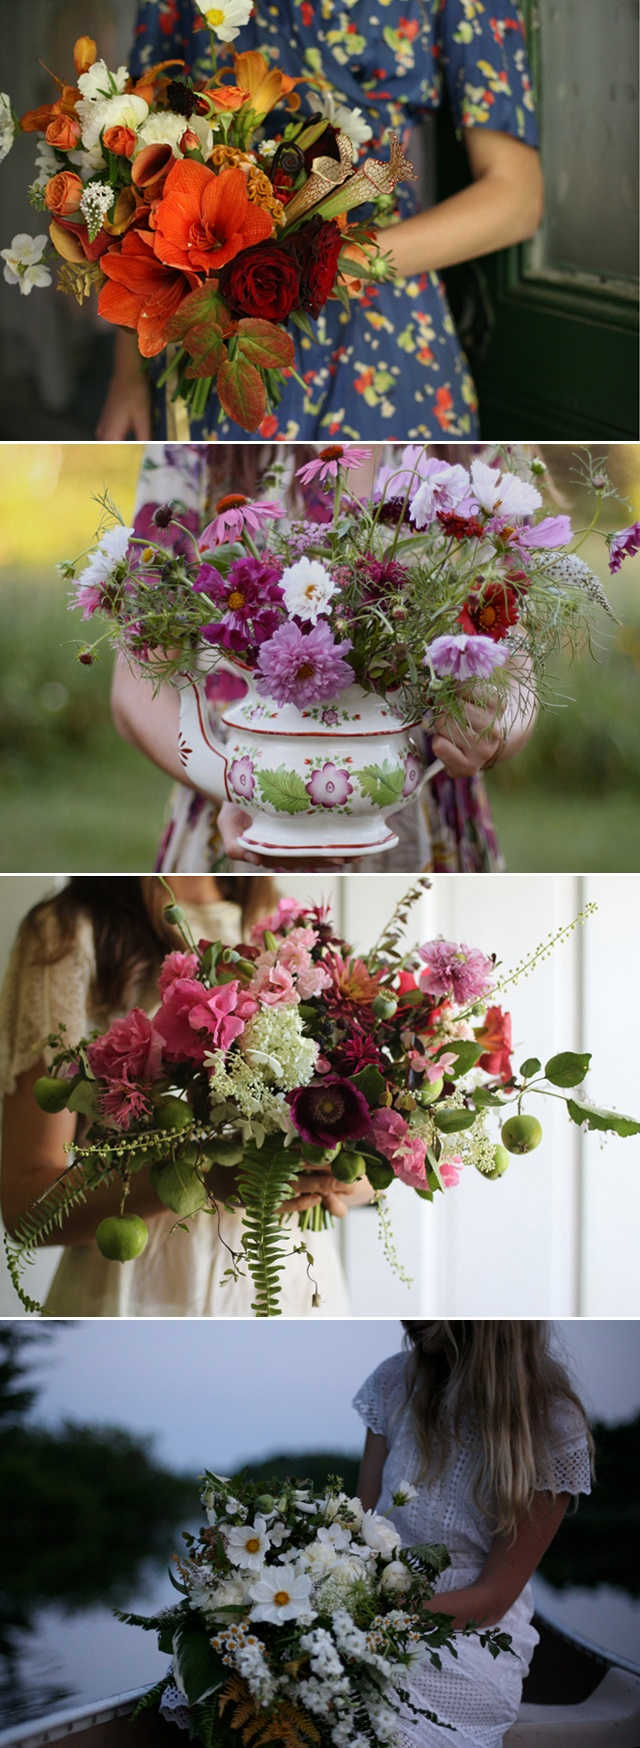 best I uc Weddings Flowers images on Pinterest  Bridal bouquets